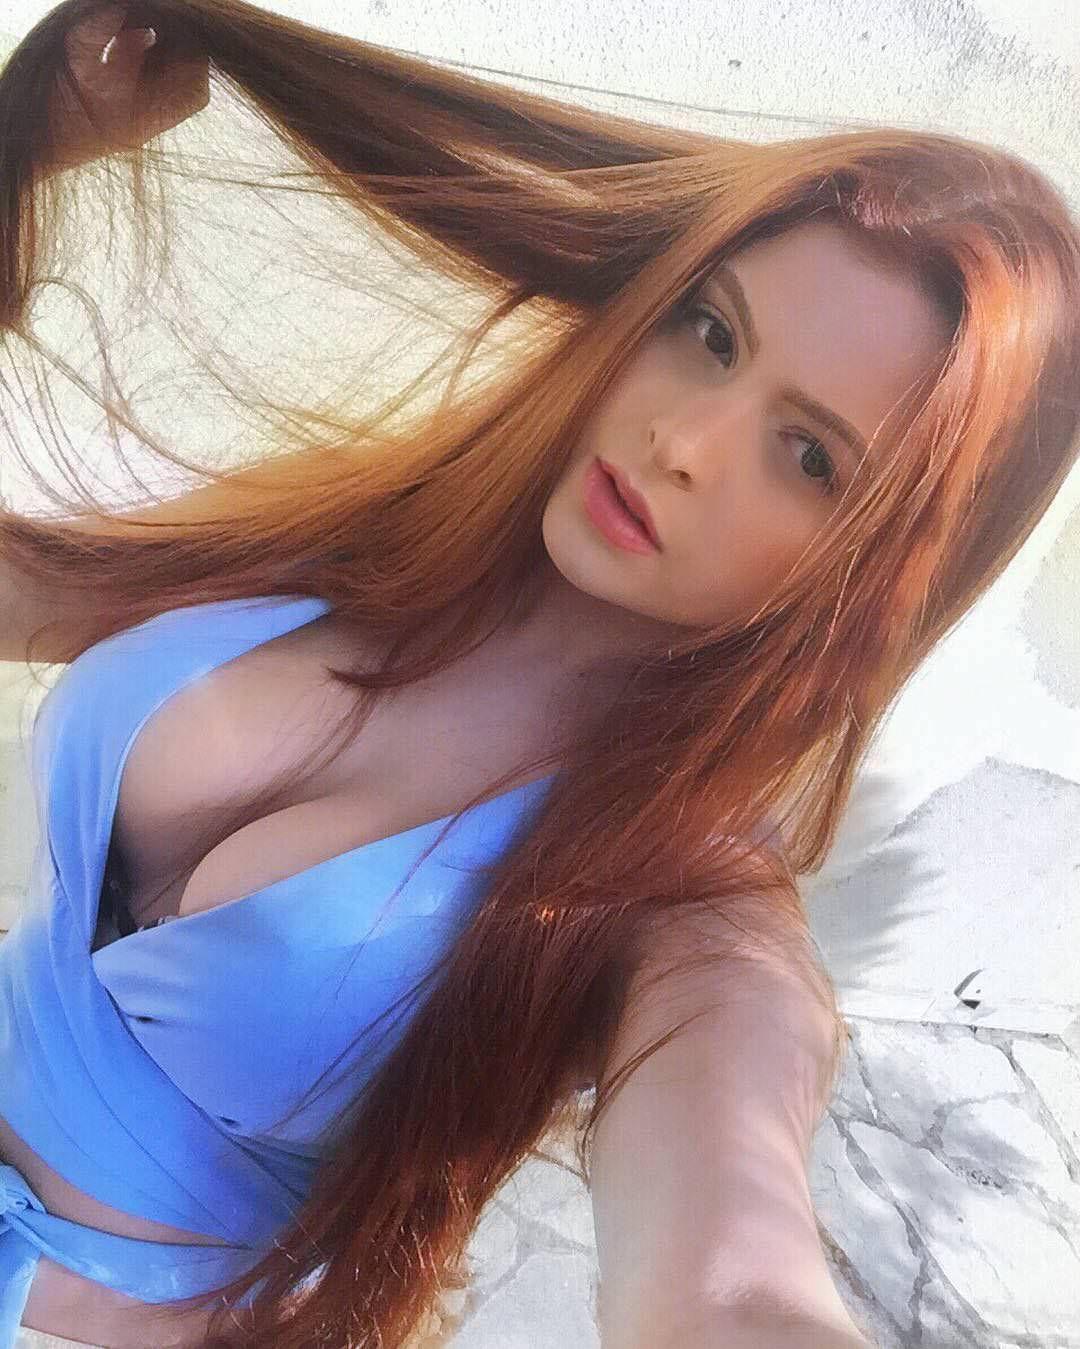 Sexy hair babes, hot girl poses as warriors